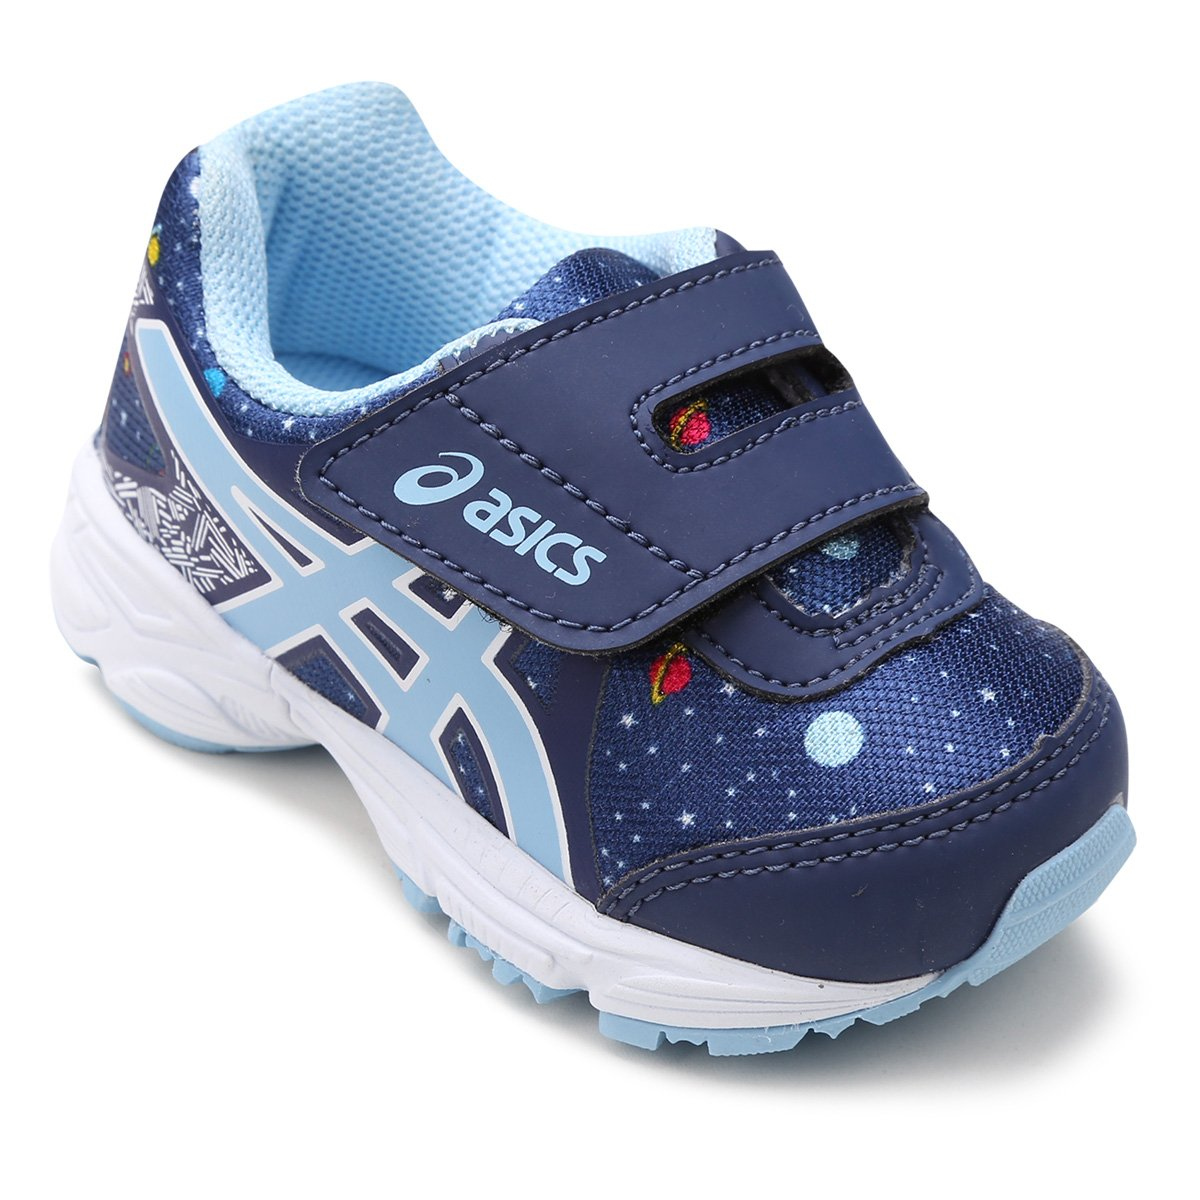 1633f1cb7f Tênis Infantil Asics Sugar Baby 3 TS Running - Azul Escuro - Compre Agora